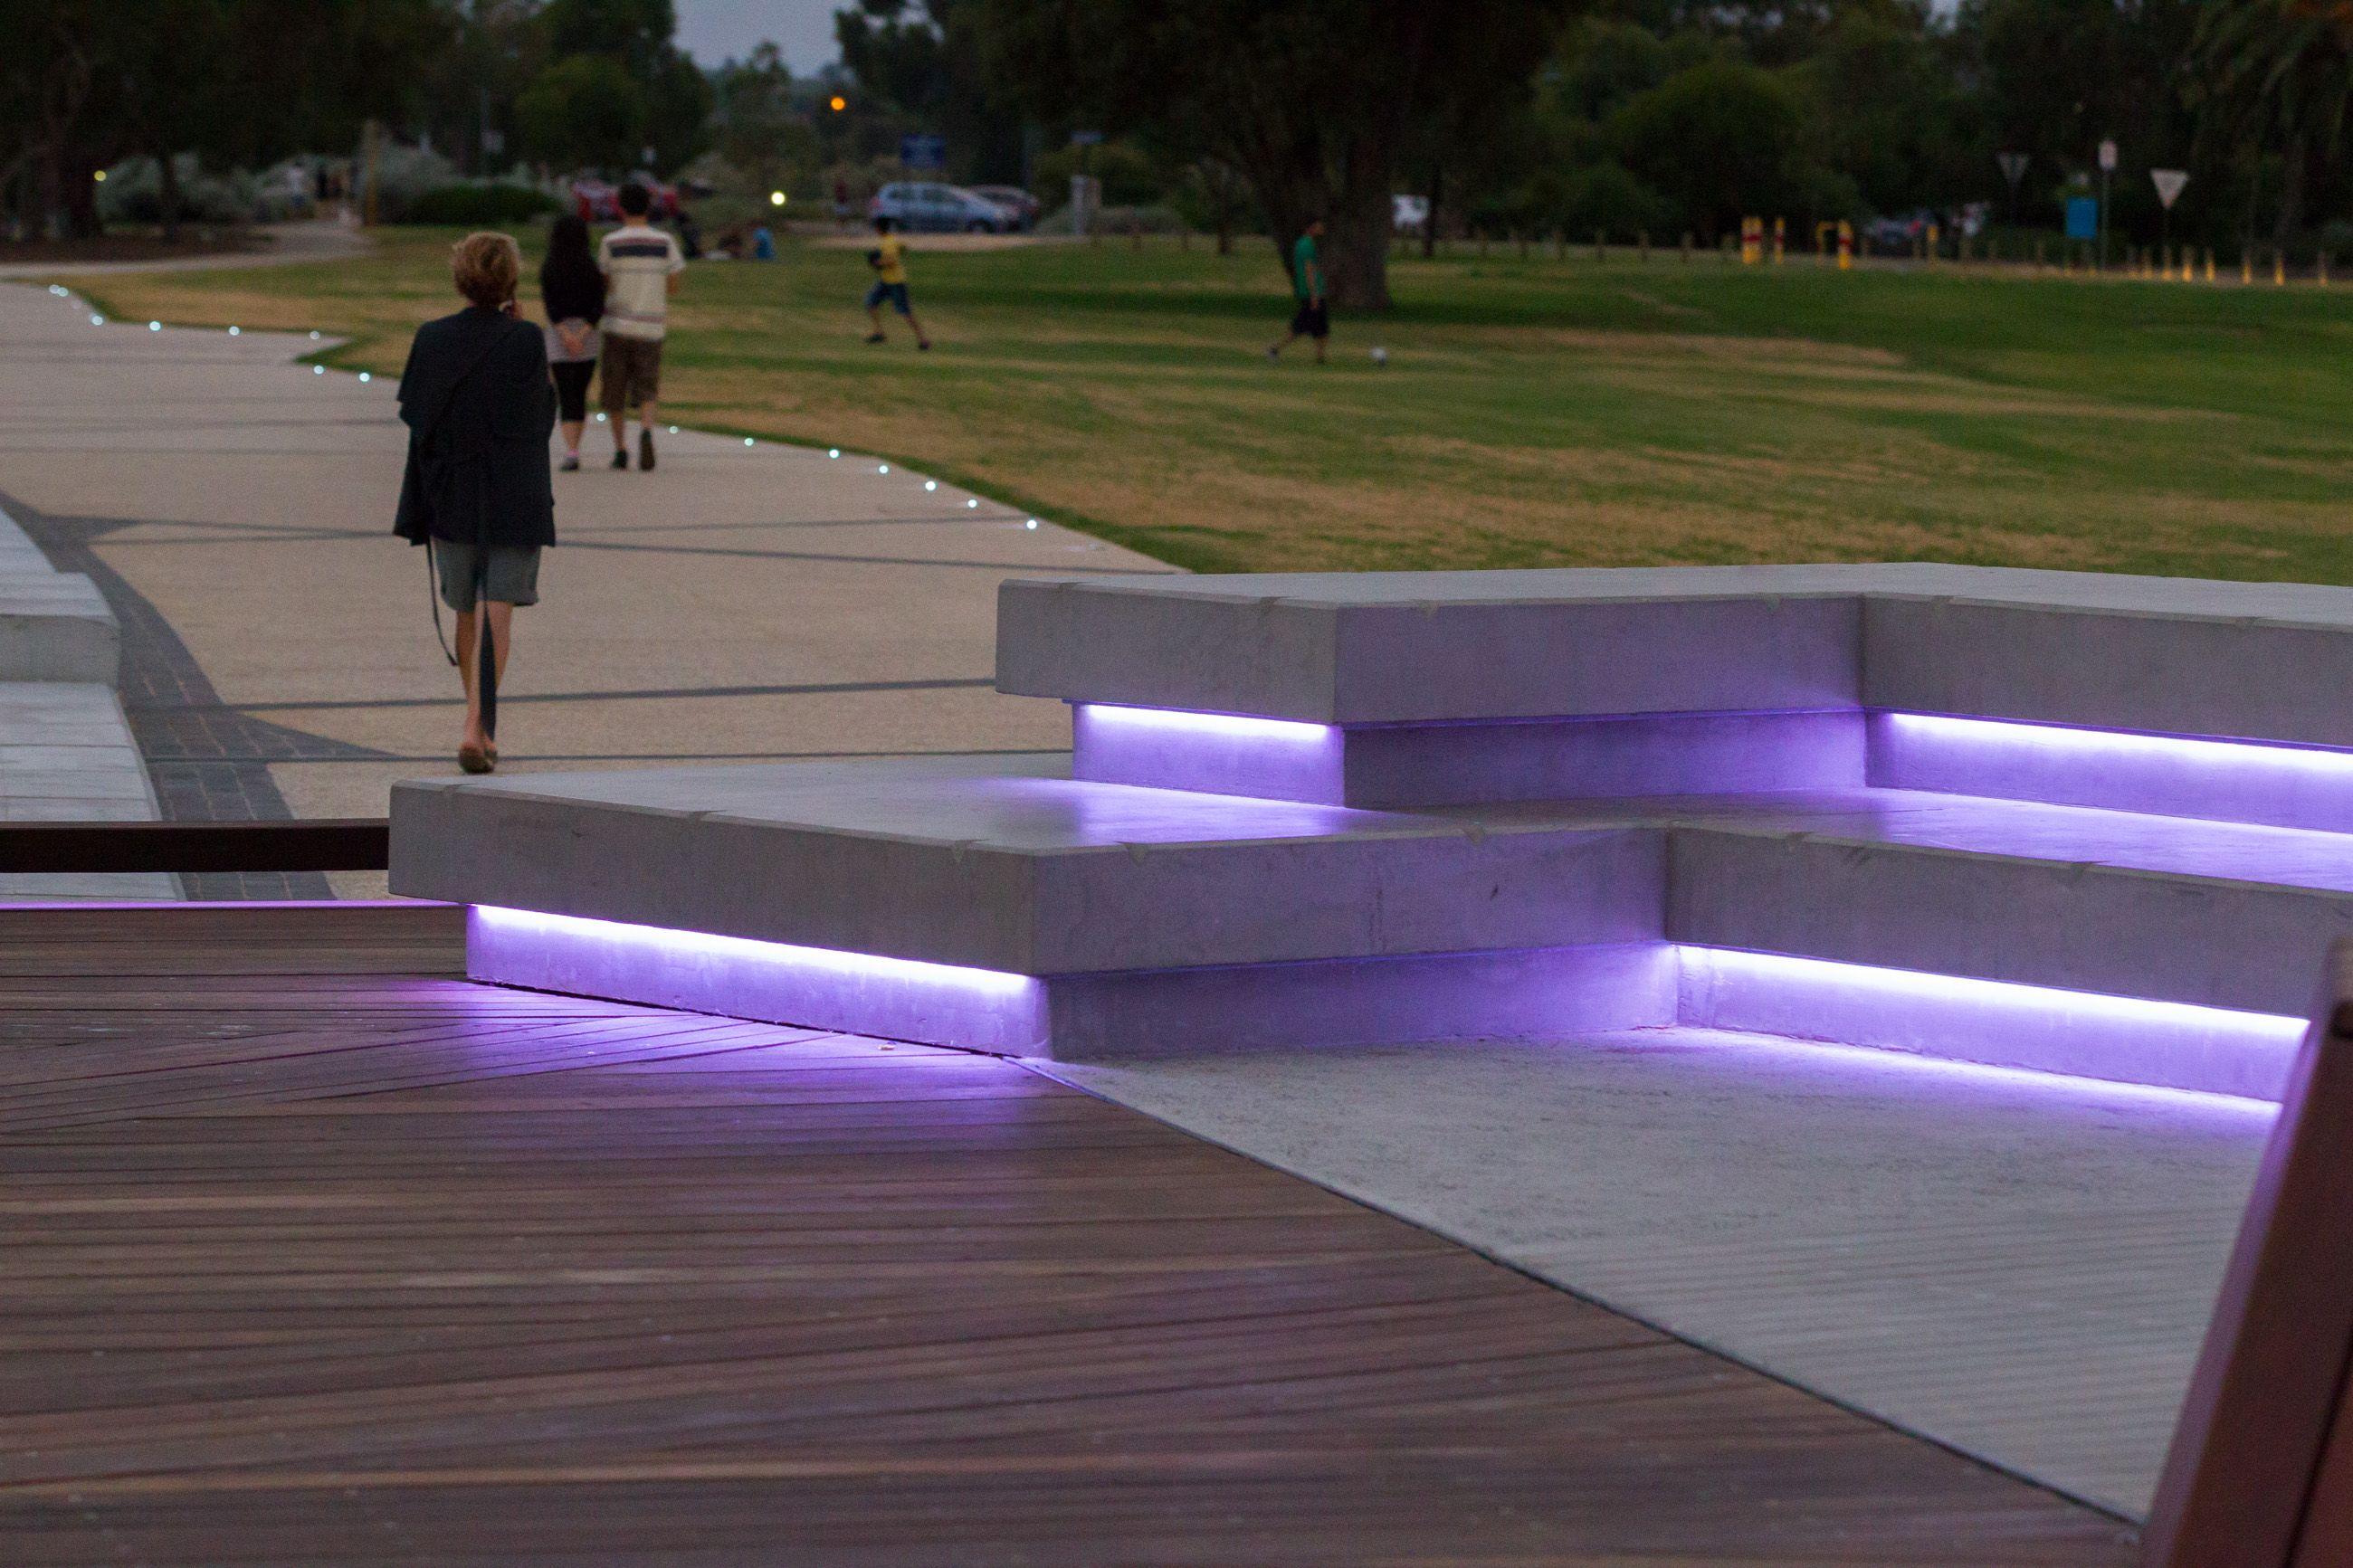 South Perth Promenade Lighting Design By Lighting Options Australia Http Www Lightingoptionsaustralia Com Au Lightingopt Design Giardino Design Giardino